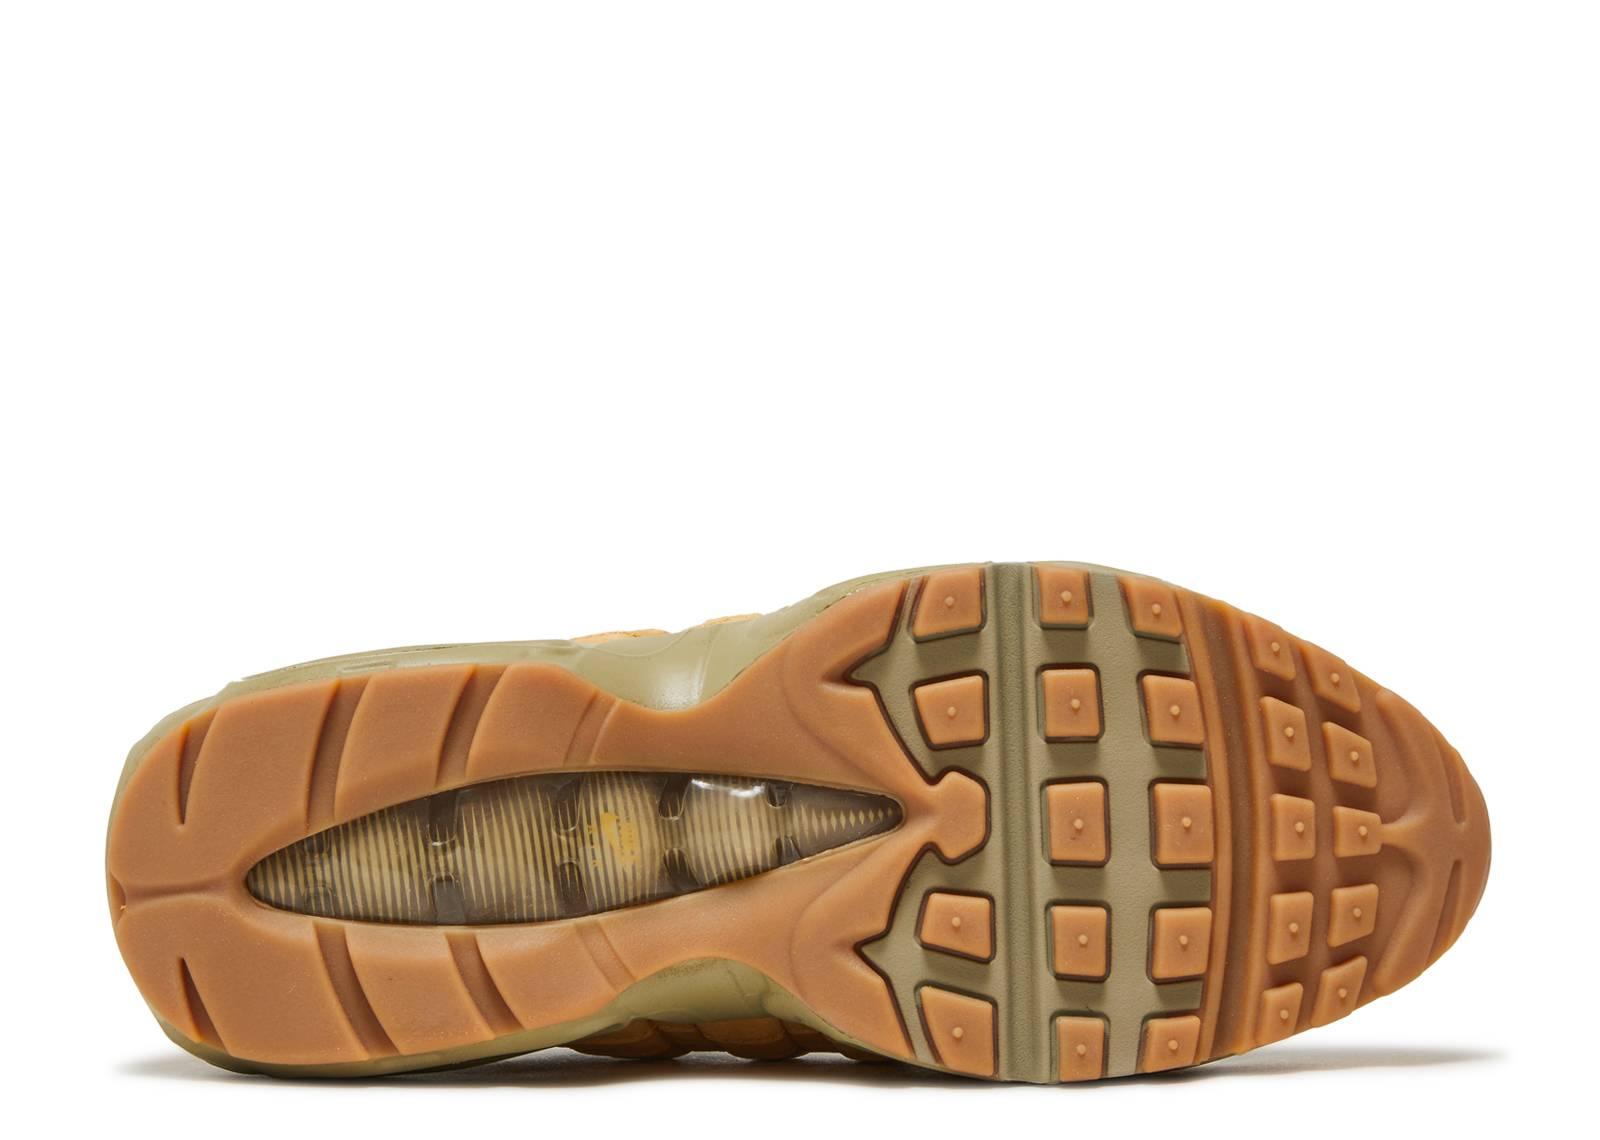 Nike Air Max 95 Prm Wheat leoncamier.co.uk